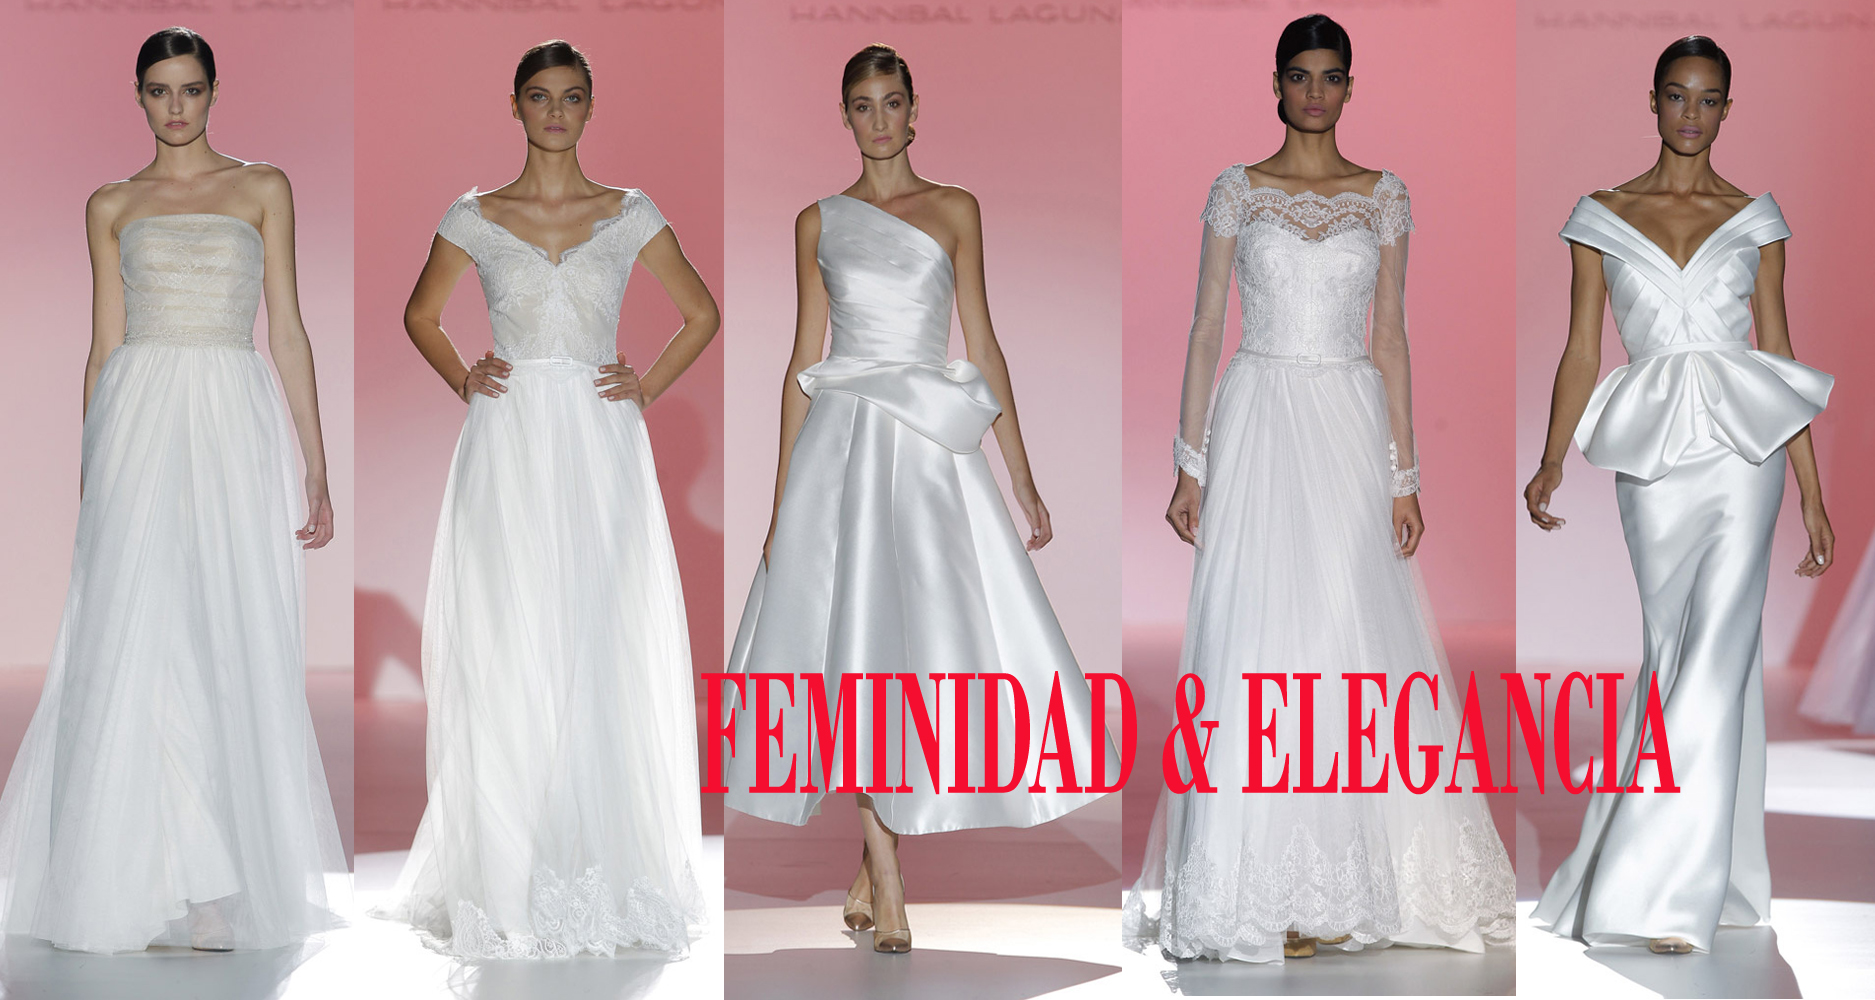 Hannibal Laguna – MissLaura, Fashion Stylist